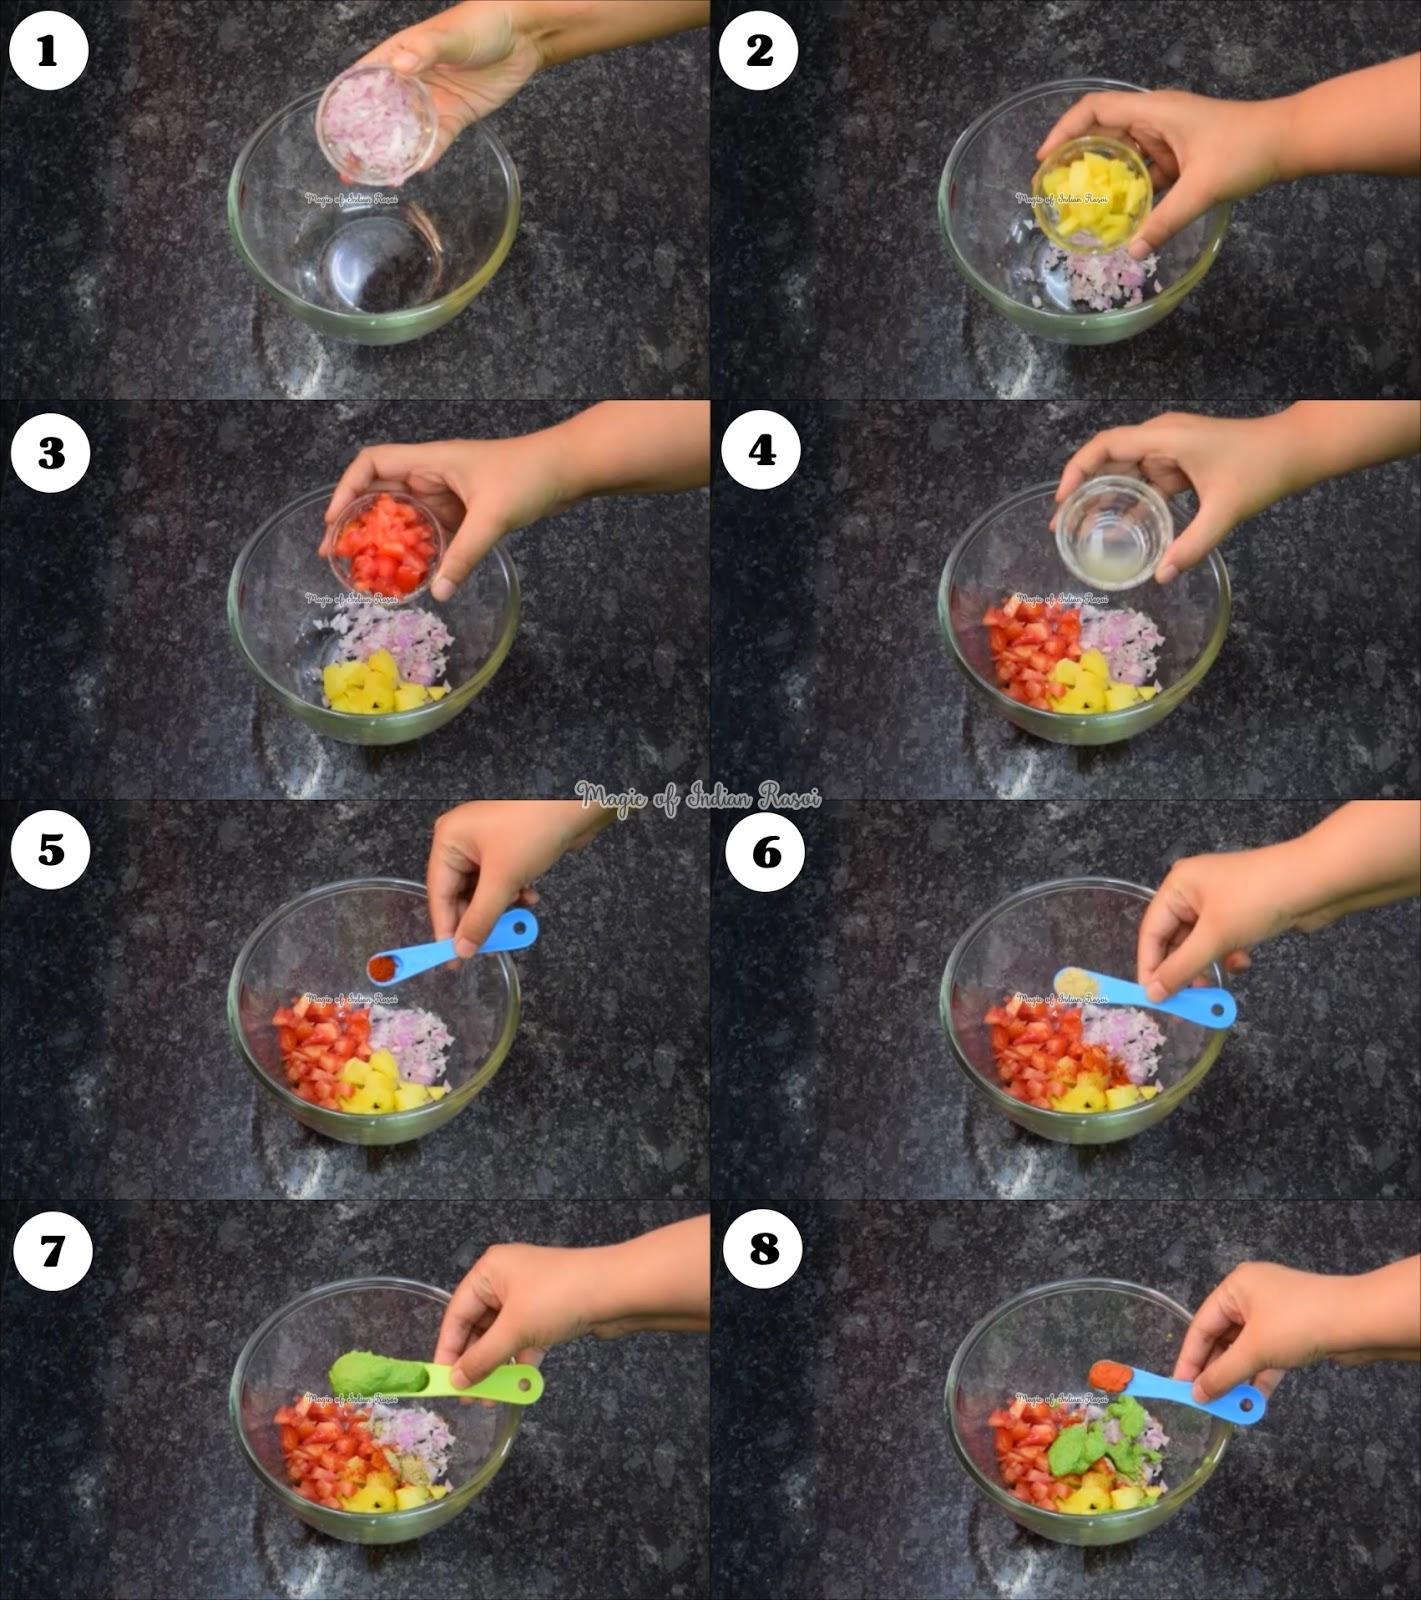 Bhel Puri (Mumbai Style) Recipe - Murmura Bhel - भेलपुरी (मुंबई स्टाइल) रेसिपी - मुरमुरा भेल - Priya R - Magic of Indian Rasoi